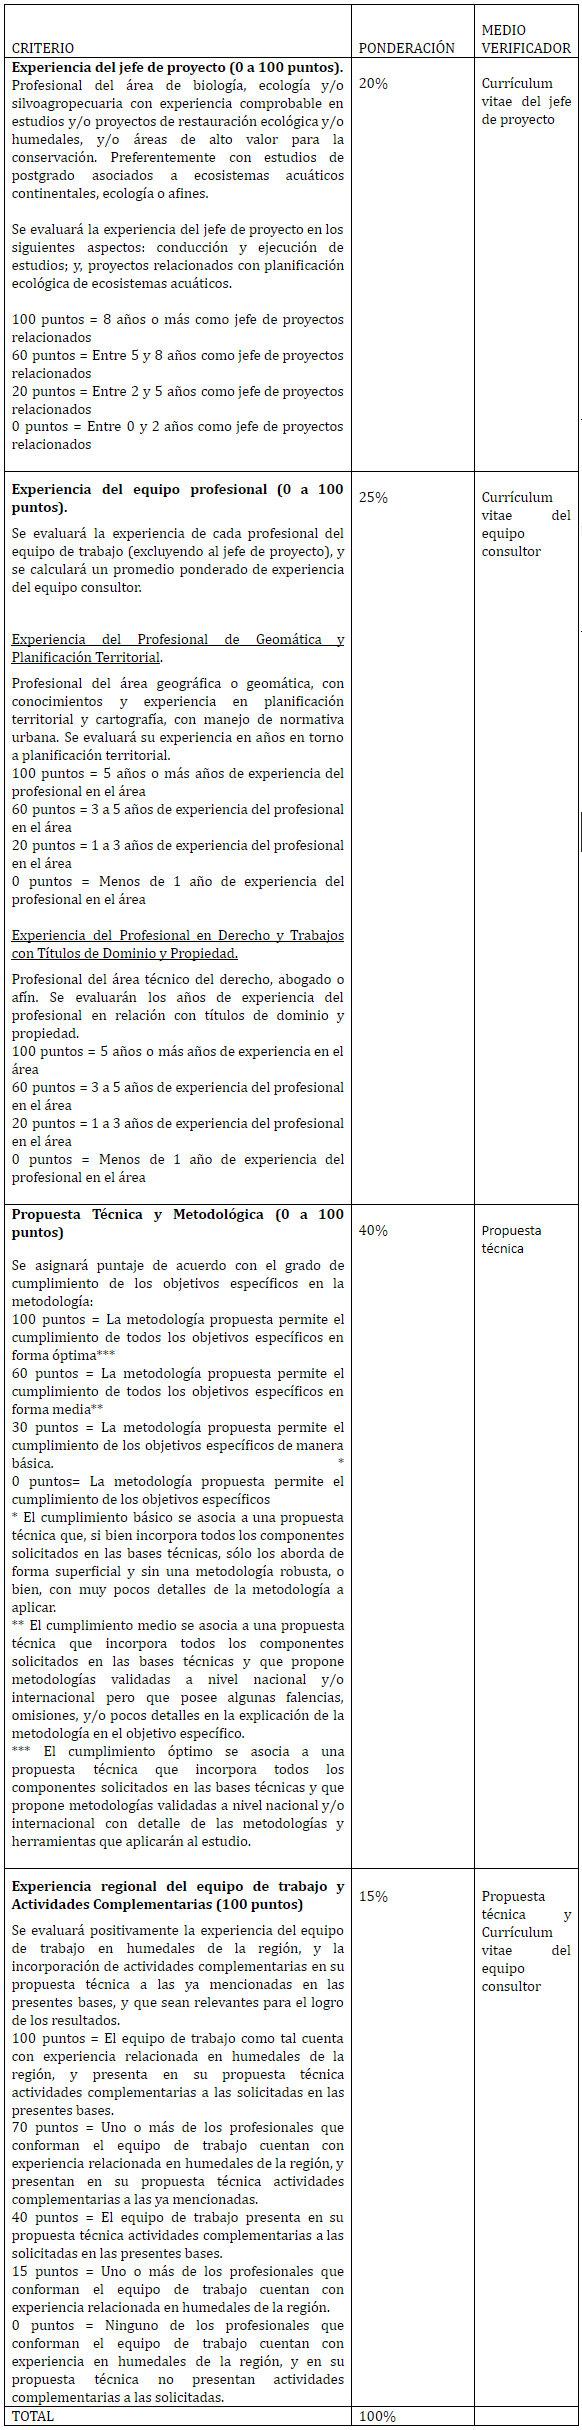 criterios gef 5.jpg